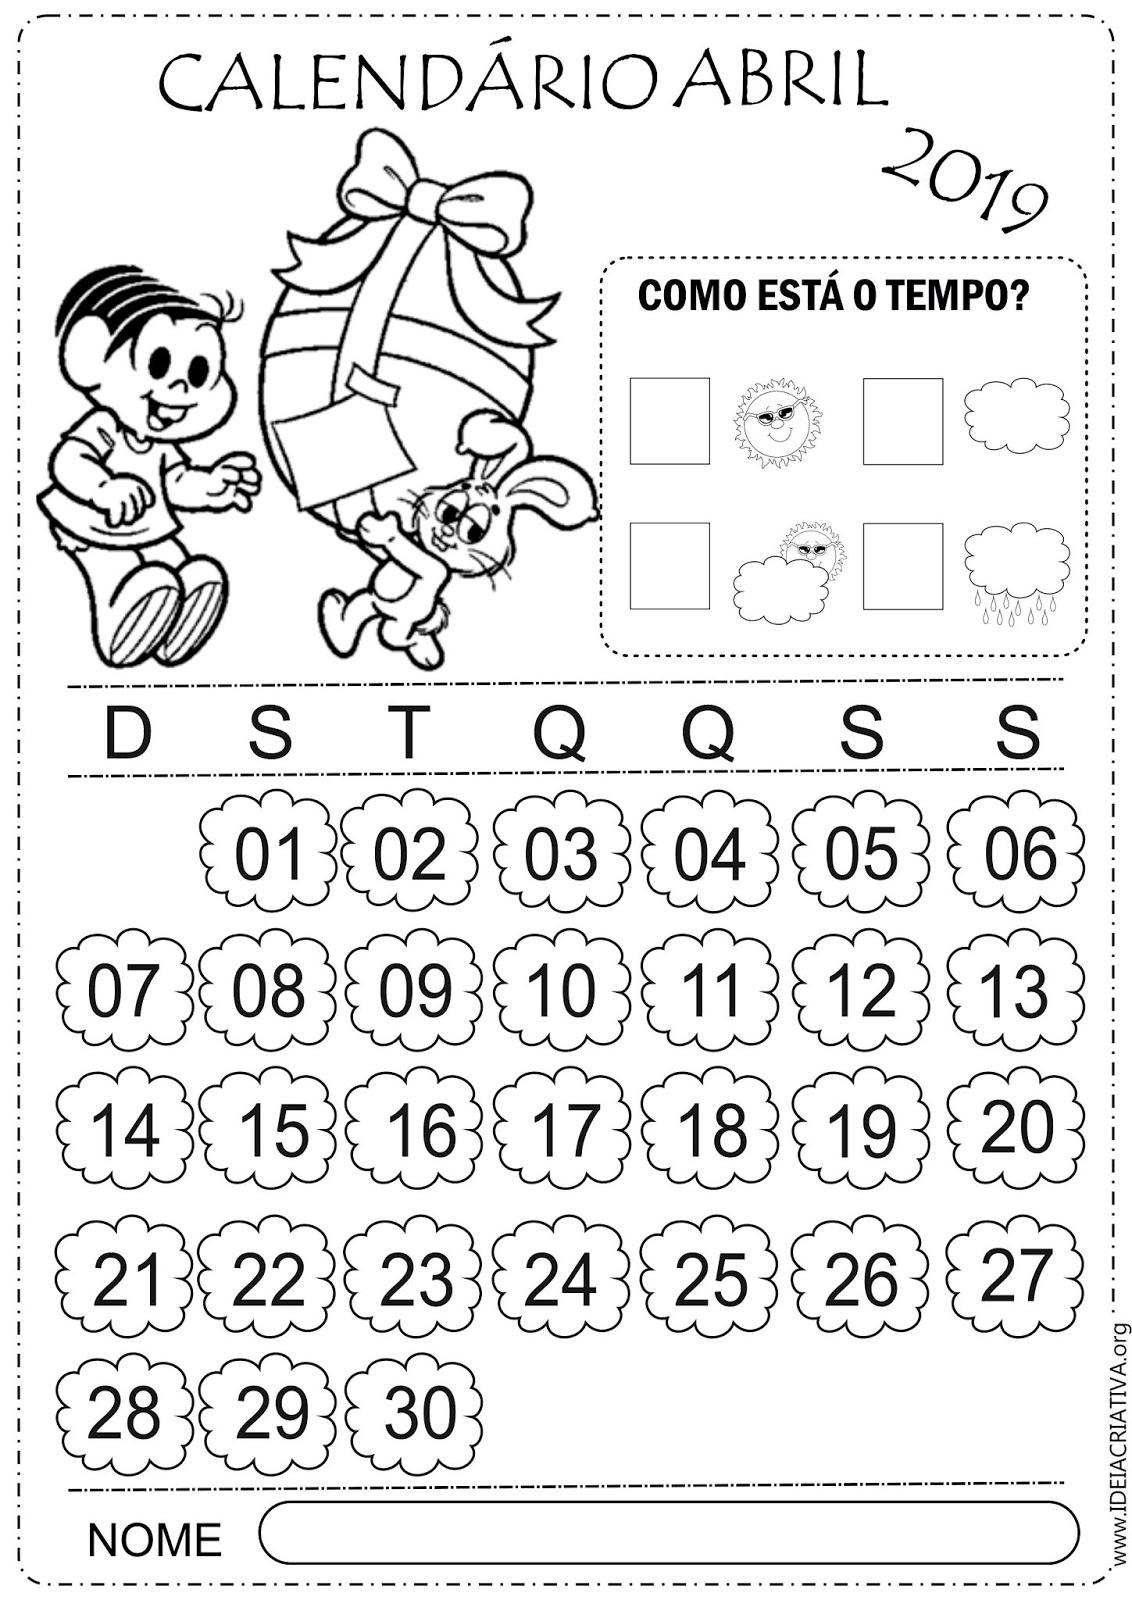 Calendarios Abril 2019 Turma Da Monica Para Imprimir E Colorir